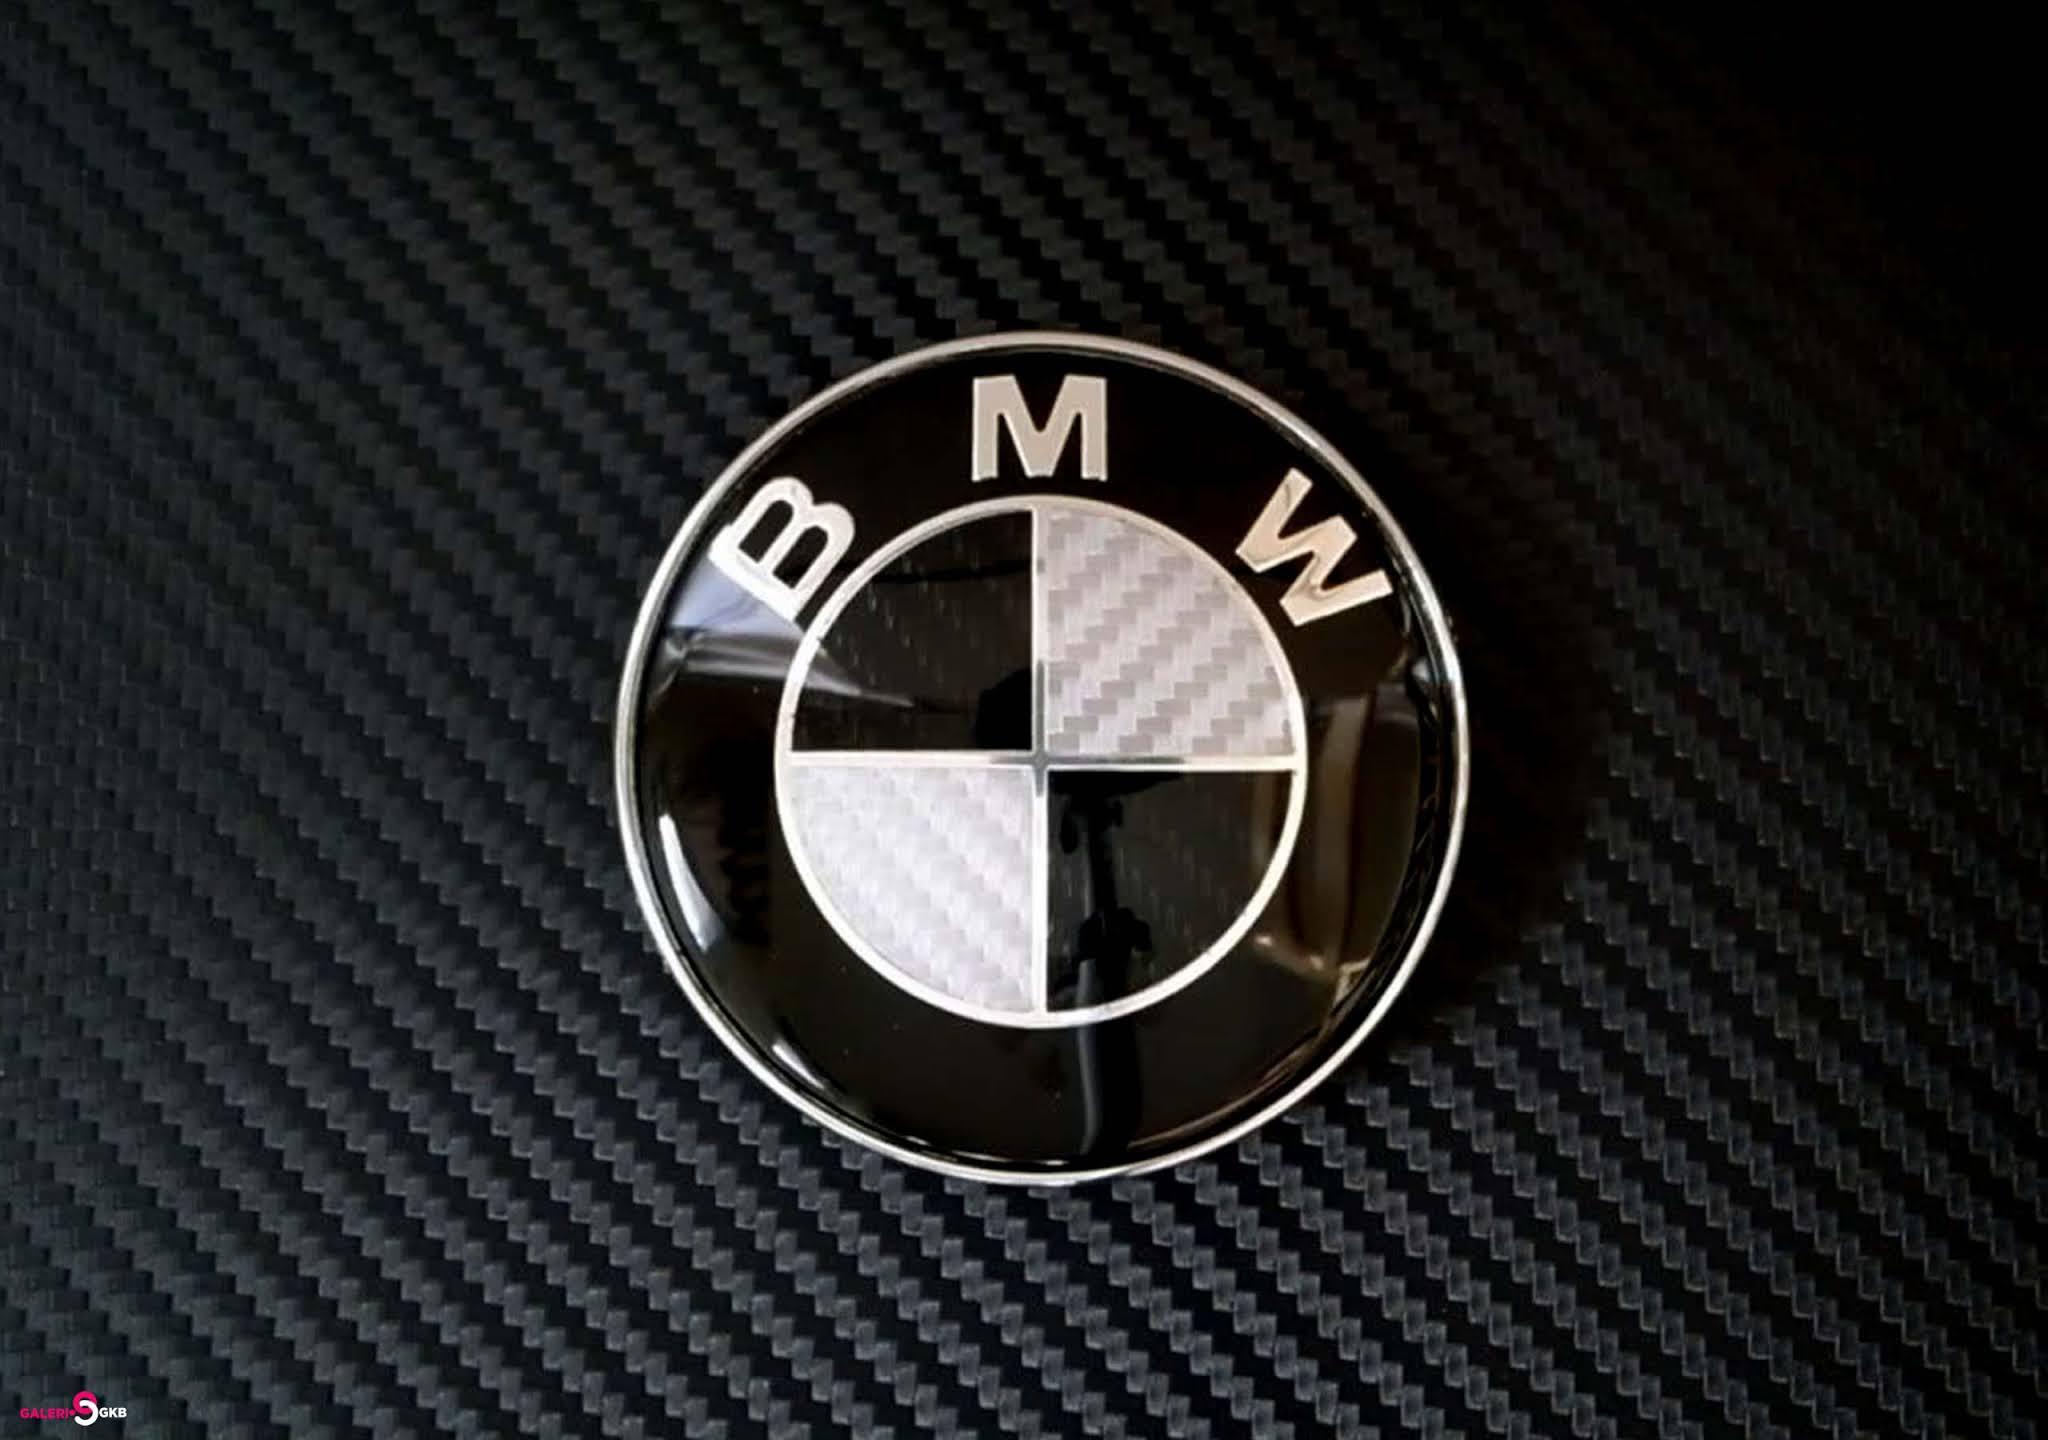 20 BMW Logo Cool HD Wallpapers 8K For Desktop Computer PC